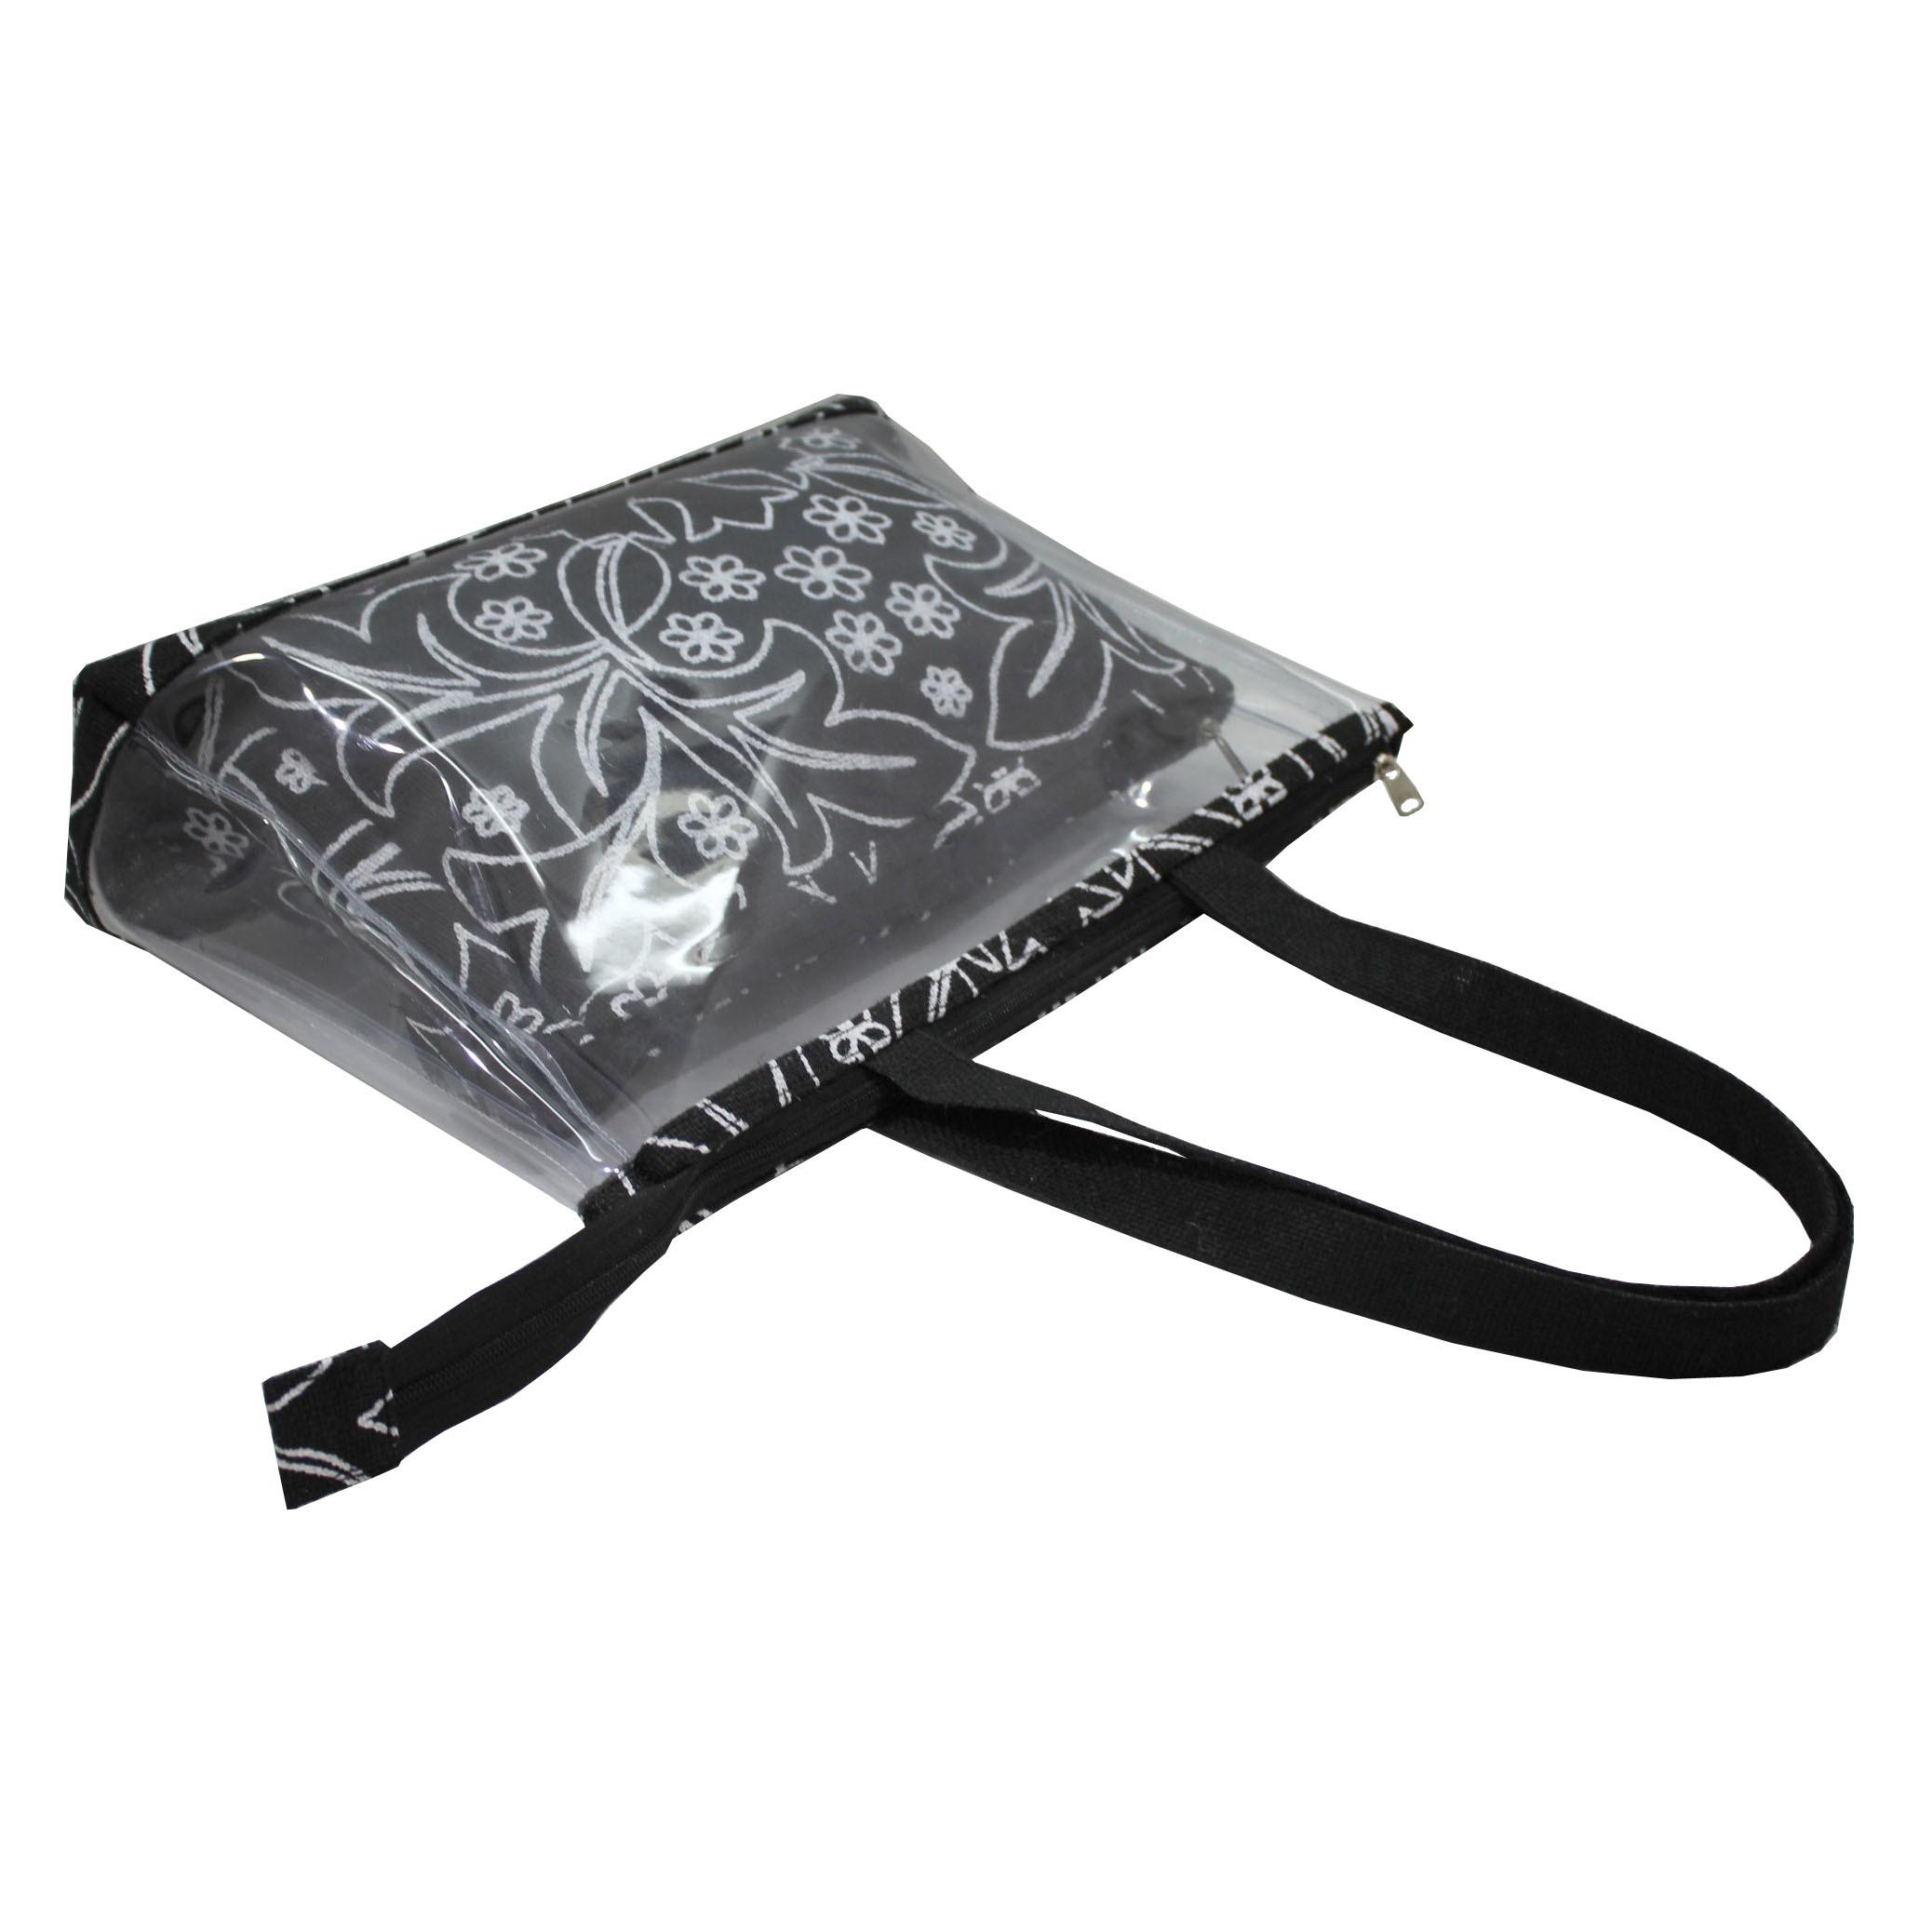 Pvc Transparent Travel Pouch With Bag